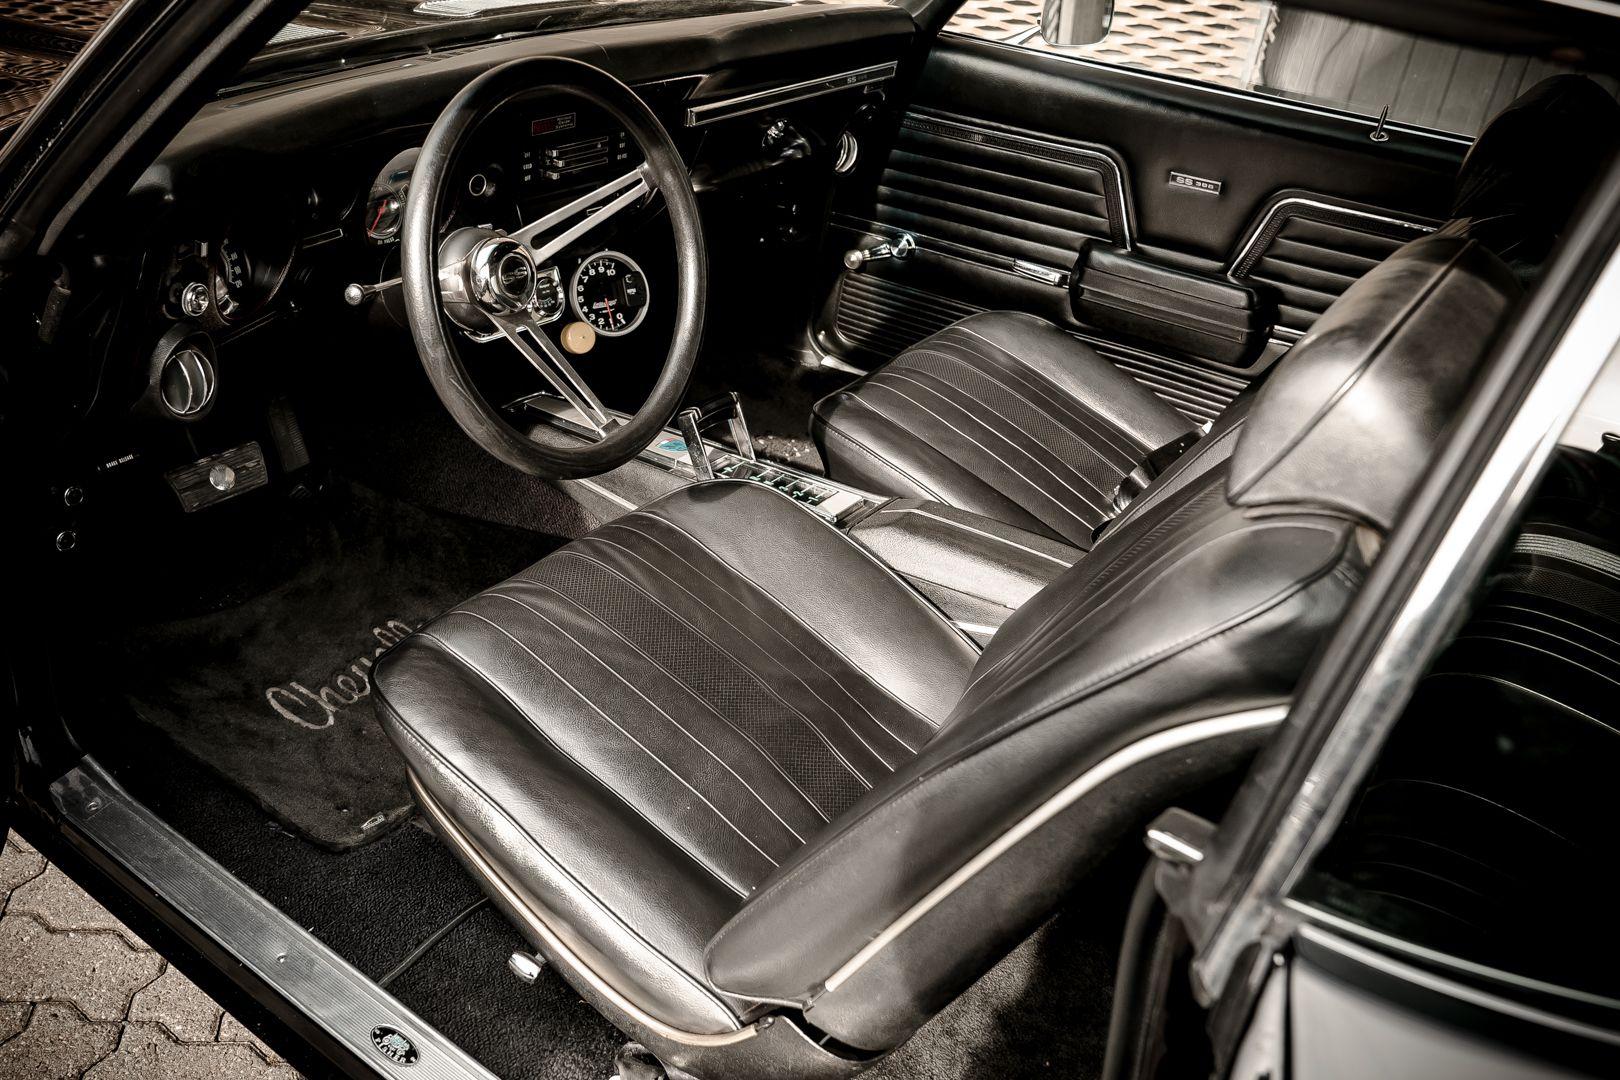 1969 Chevrolet Chevelle SS 62997